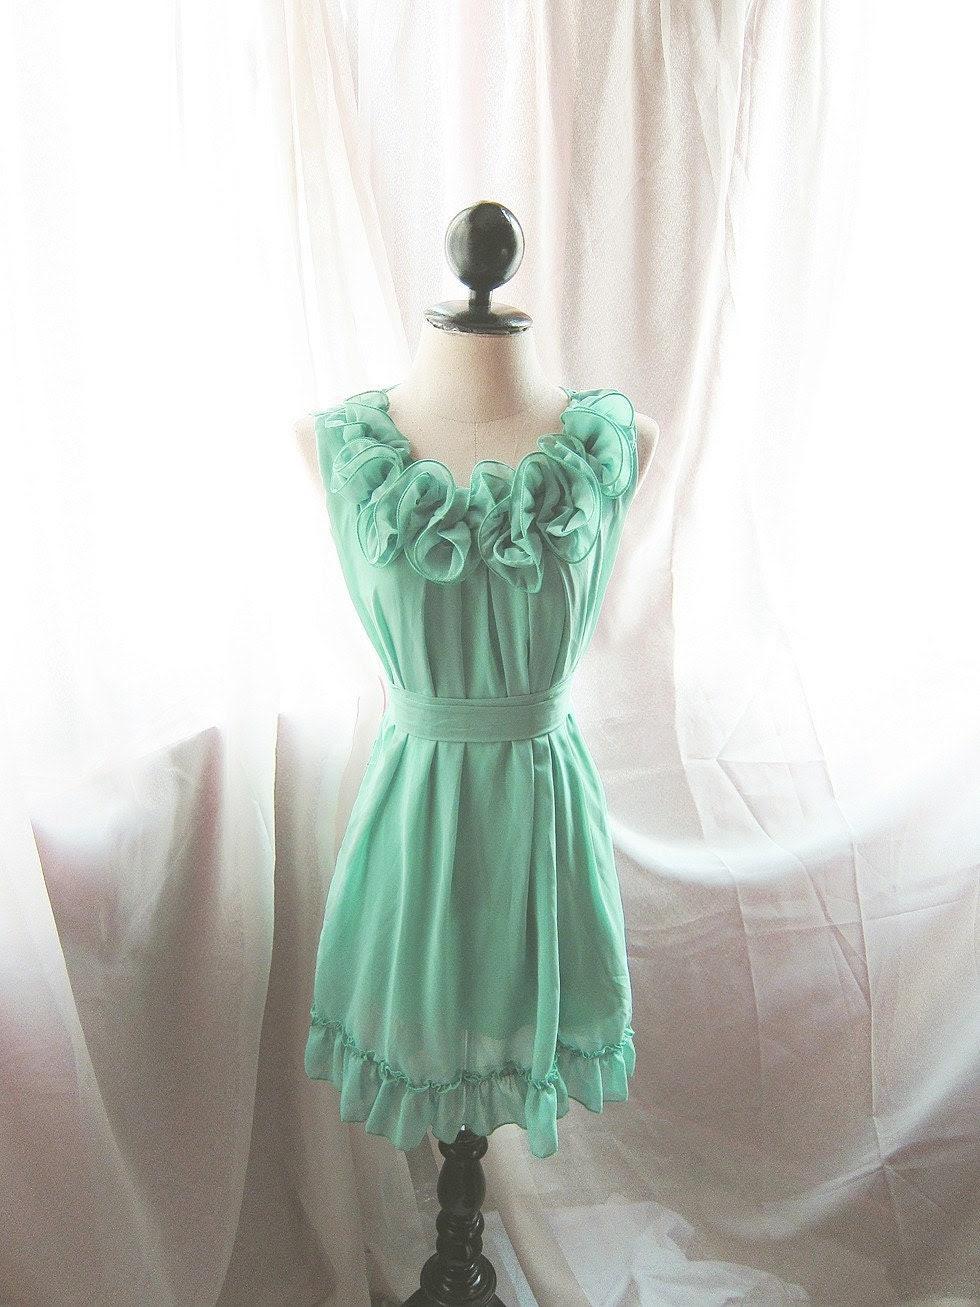 Minty Green Rose Rosette Bloom Secret Garden Alice in the Wonderland Tea Party Chiffon Ruffled Hem Dress